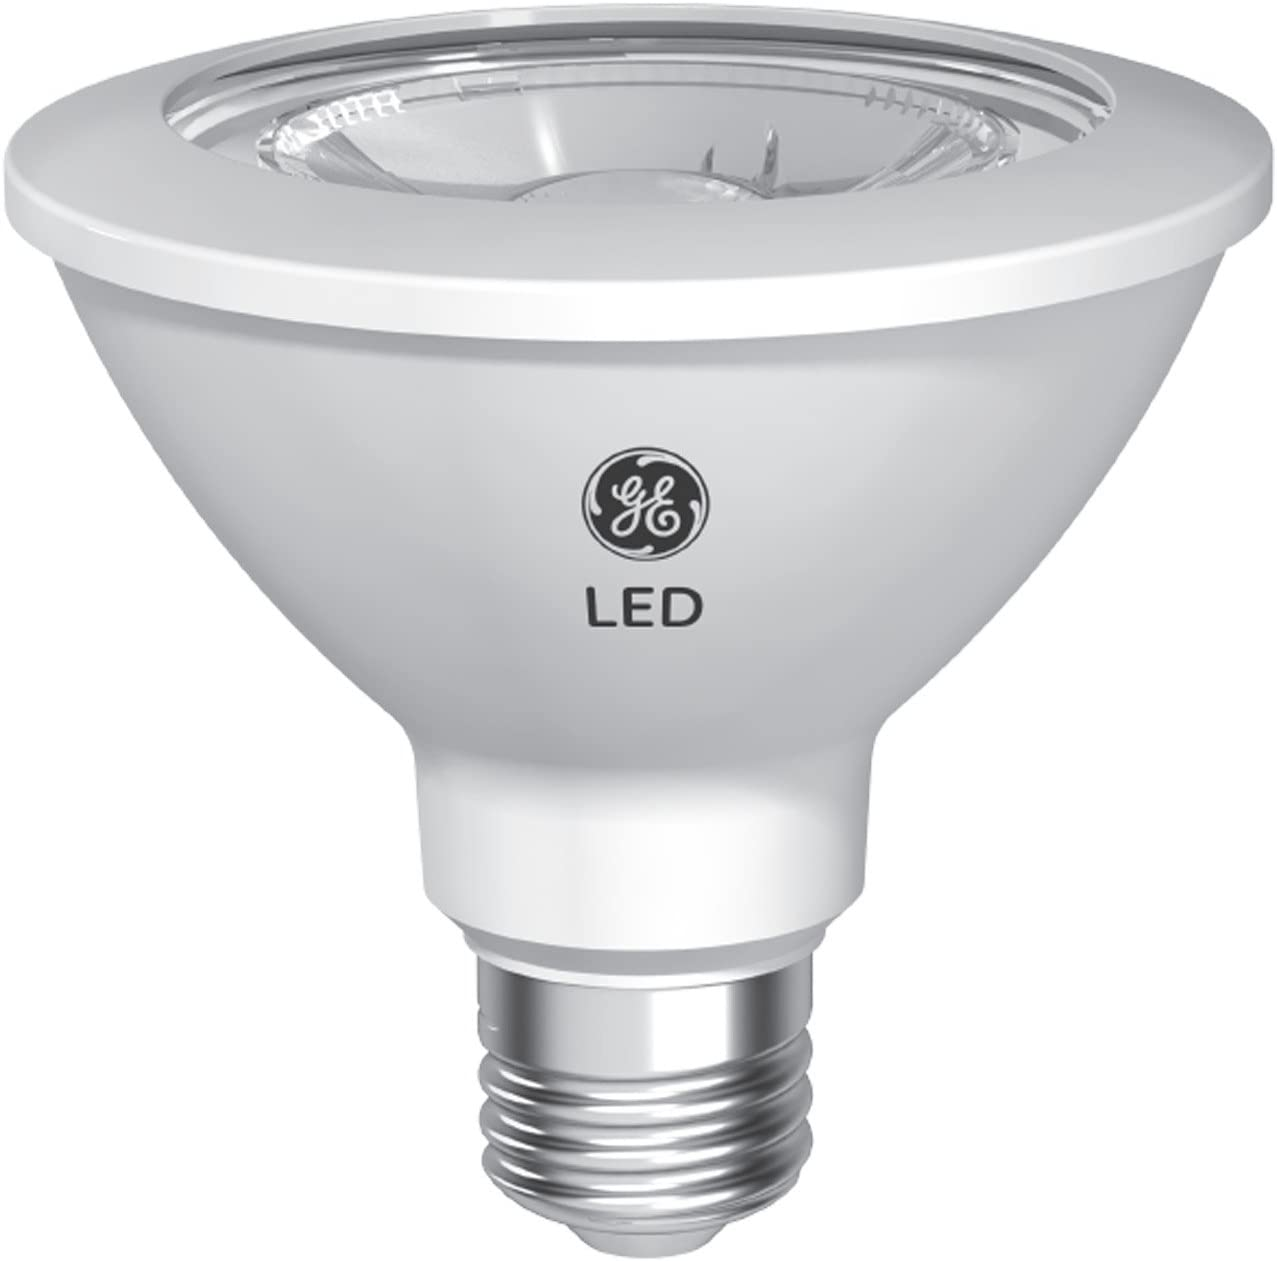 GE Lighting Relax HD LED Light Bulbs, PAR30 Short Neck LED, 75W Replacement, 2-Pack, Soft White, Dimmable LED Flood Light